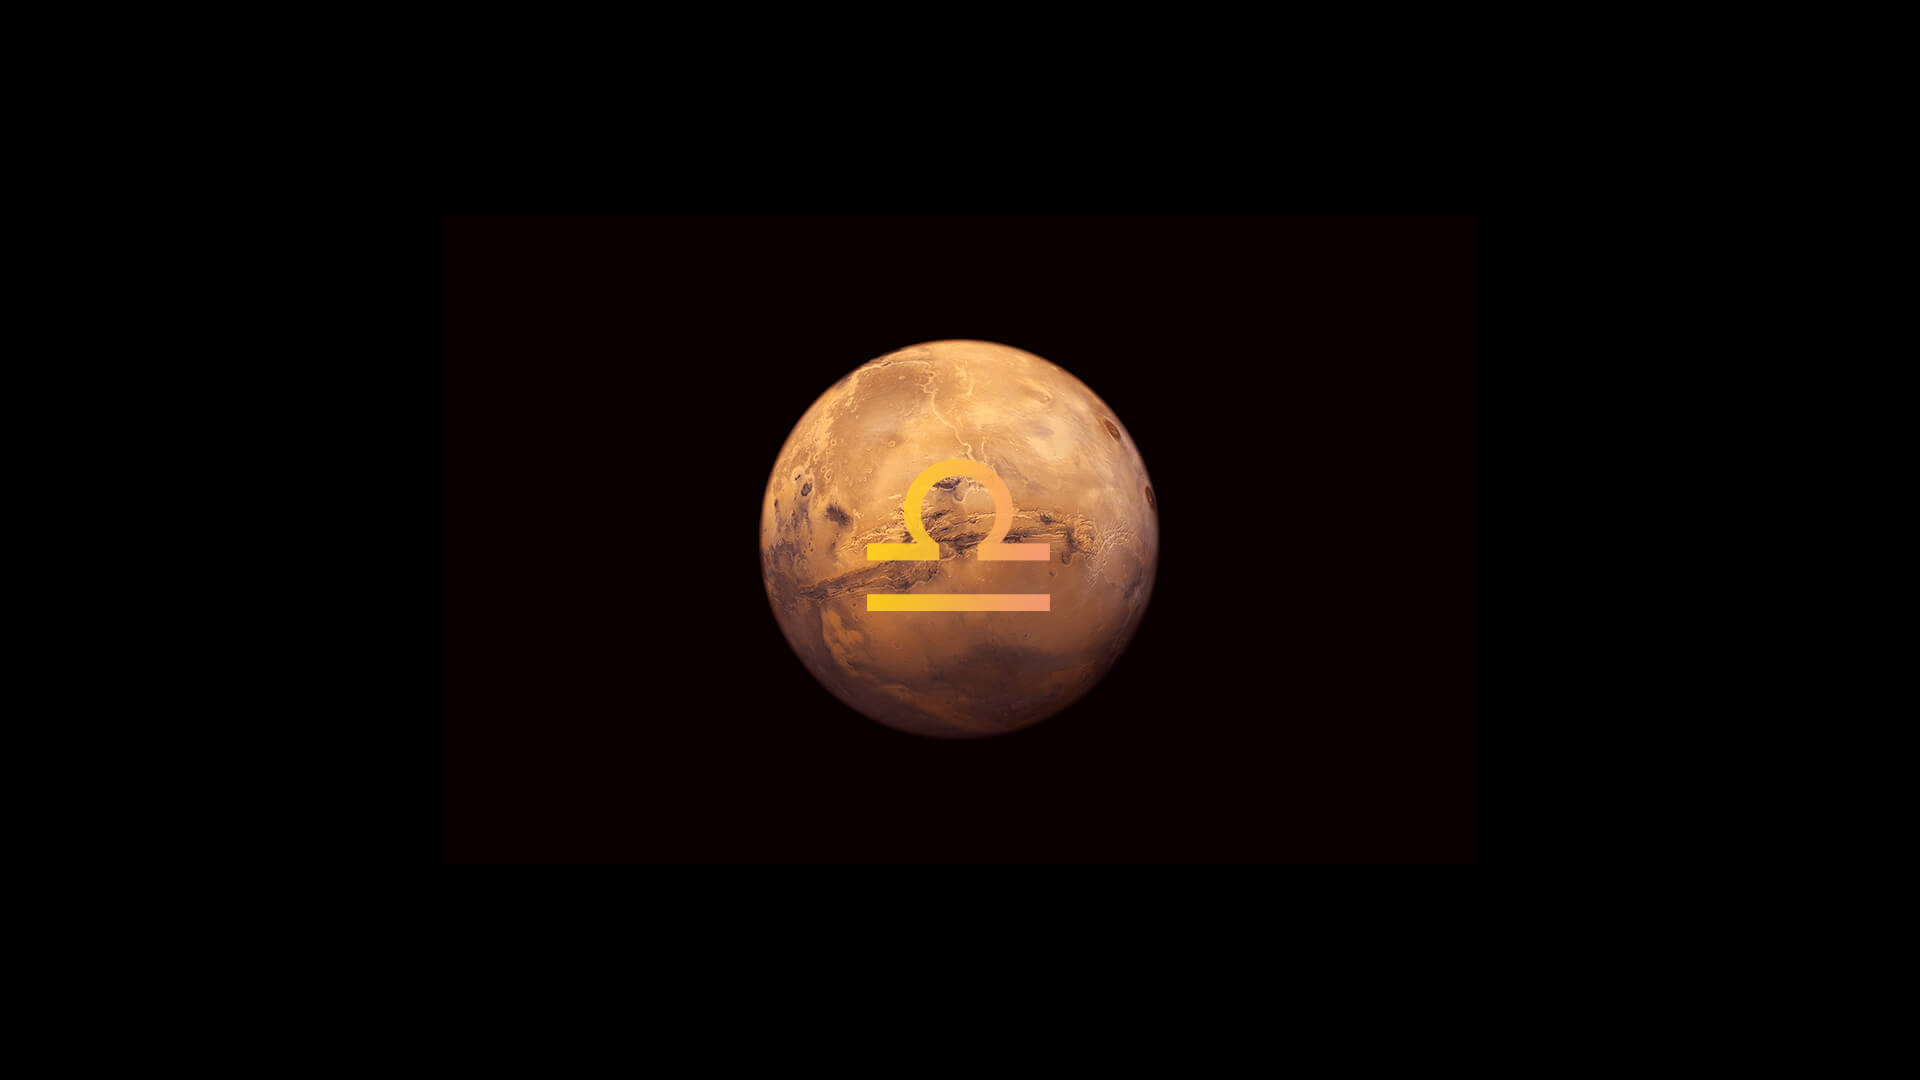 Mars enters Libra